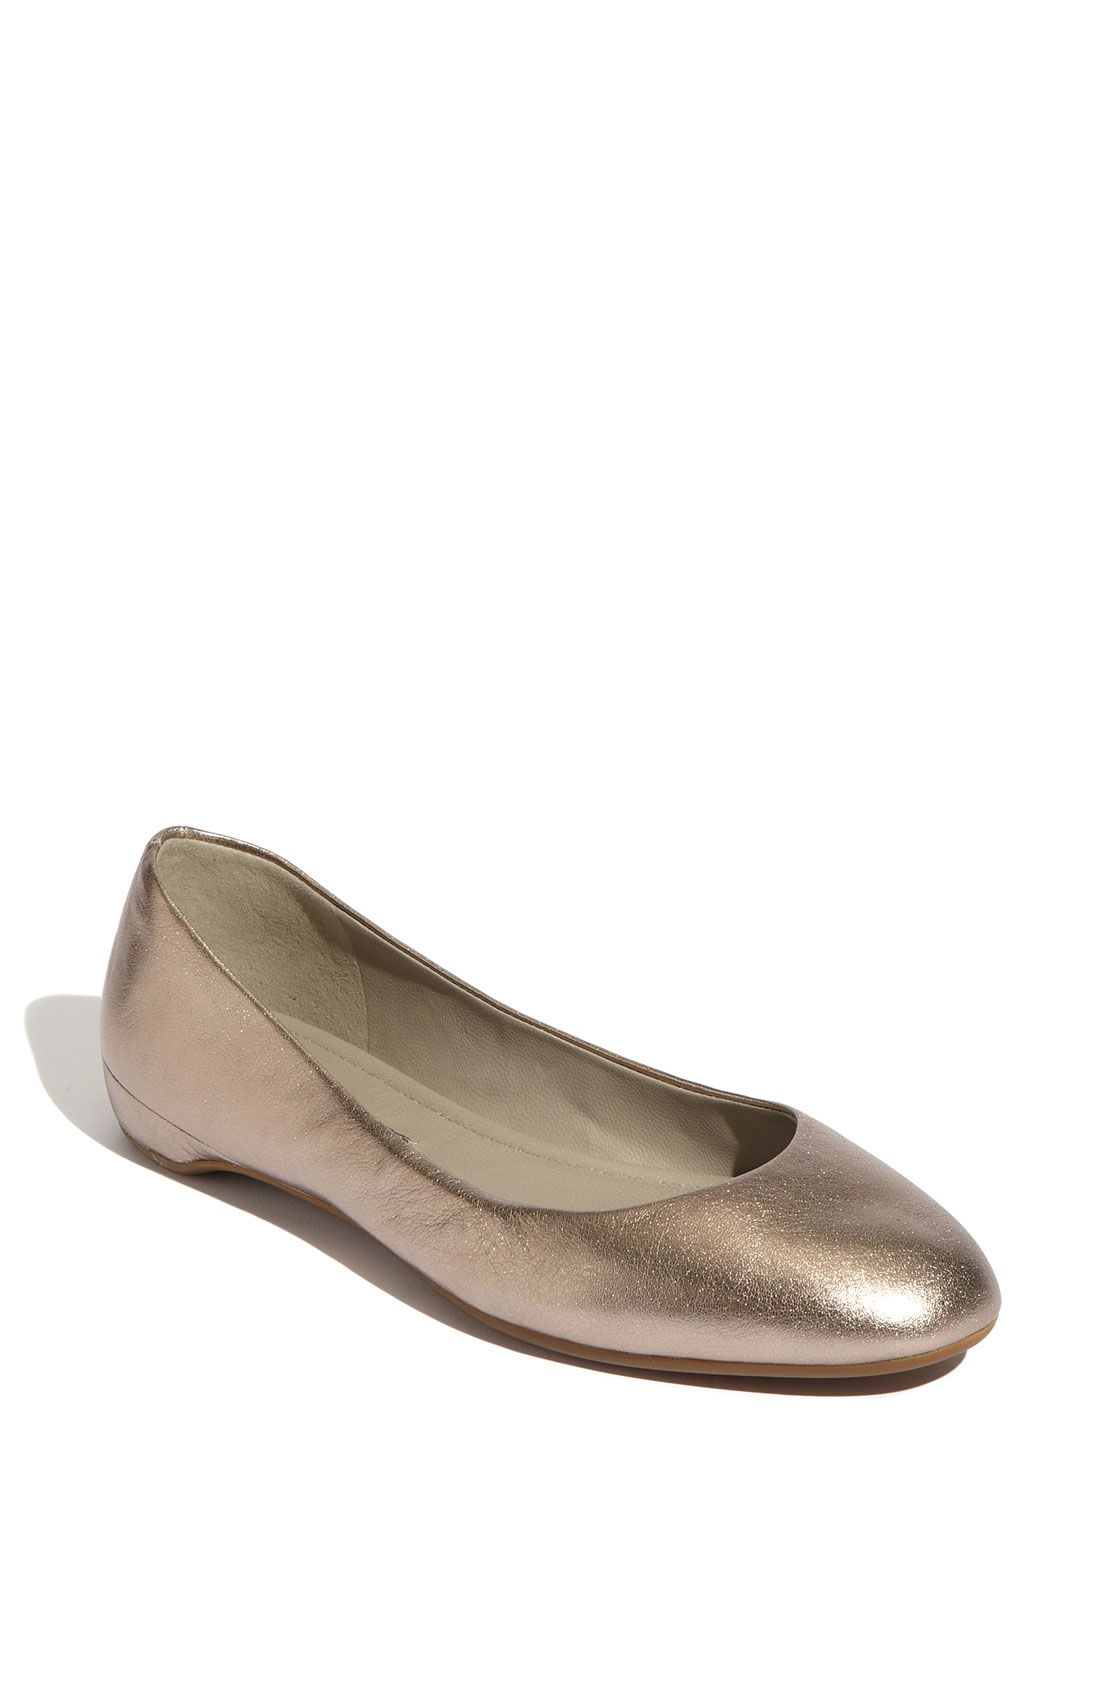 Mary Ballerina My Ecco Style FlatNordstrom Flats jc3AqS54RL